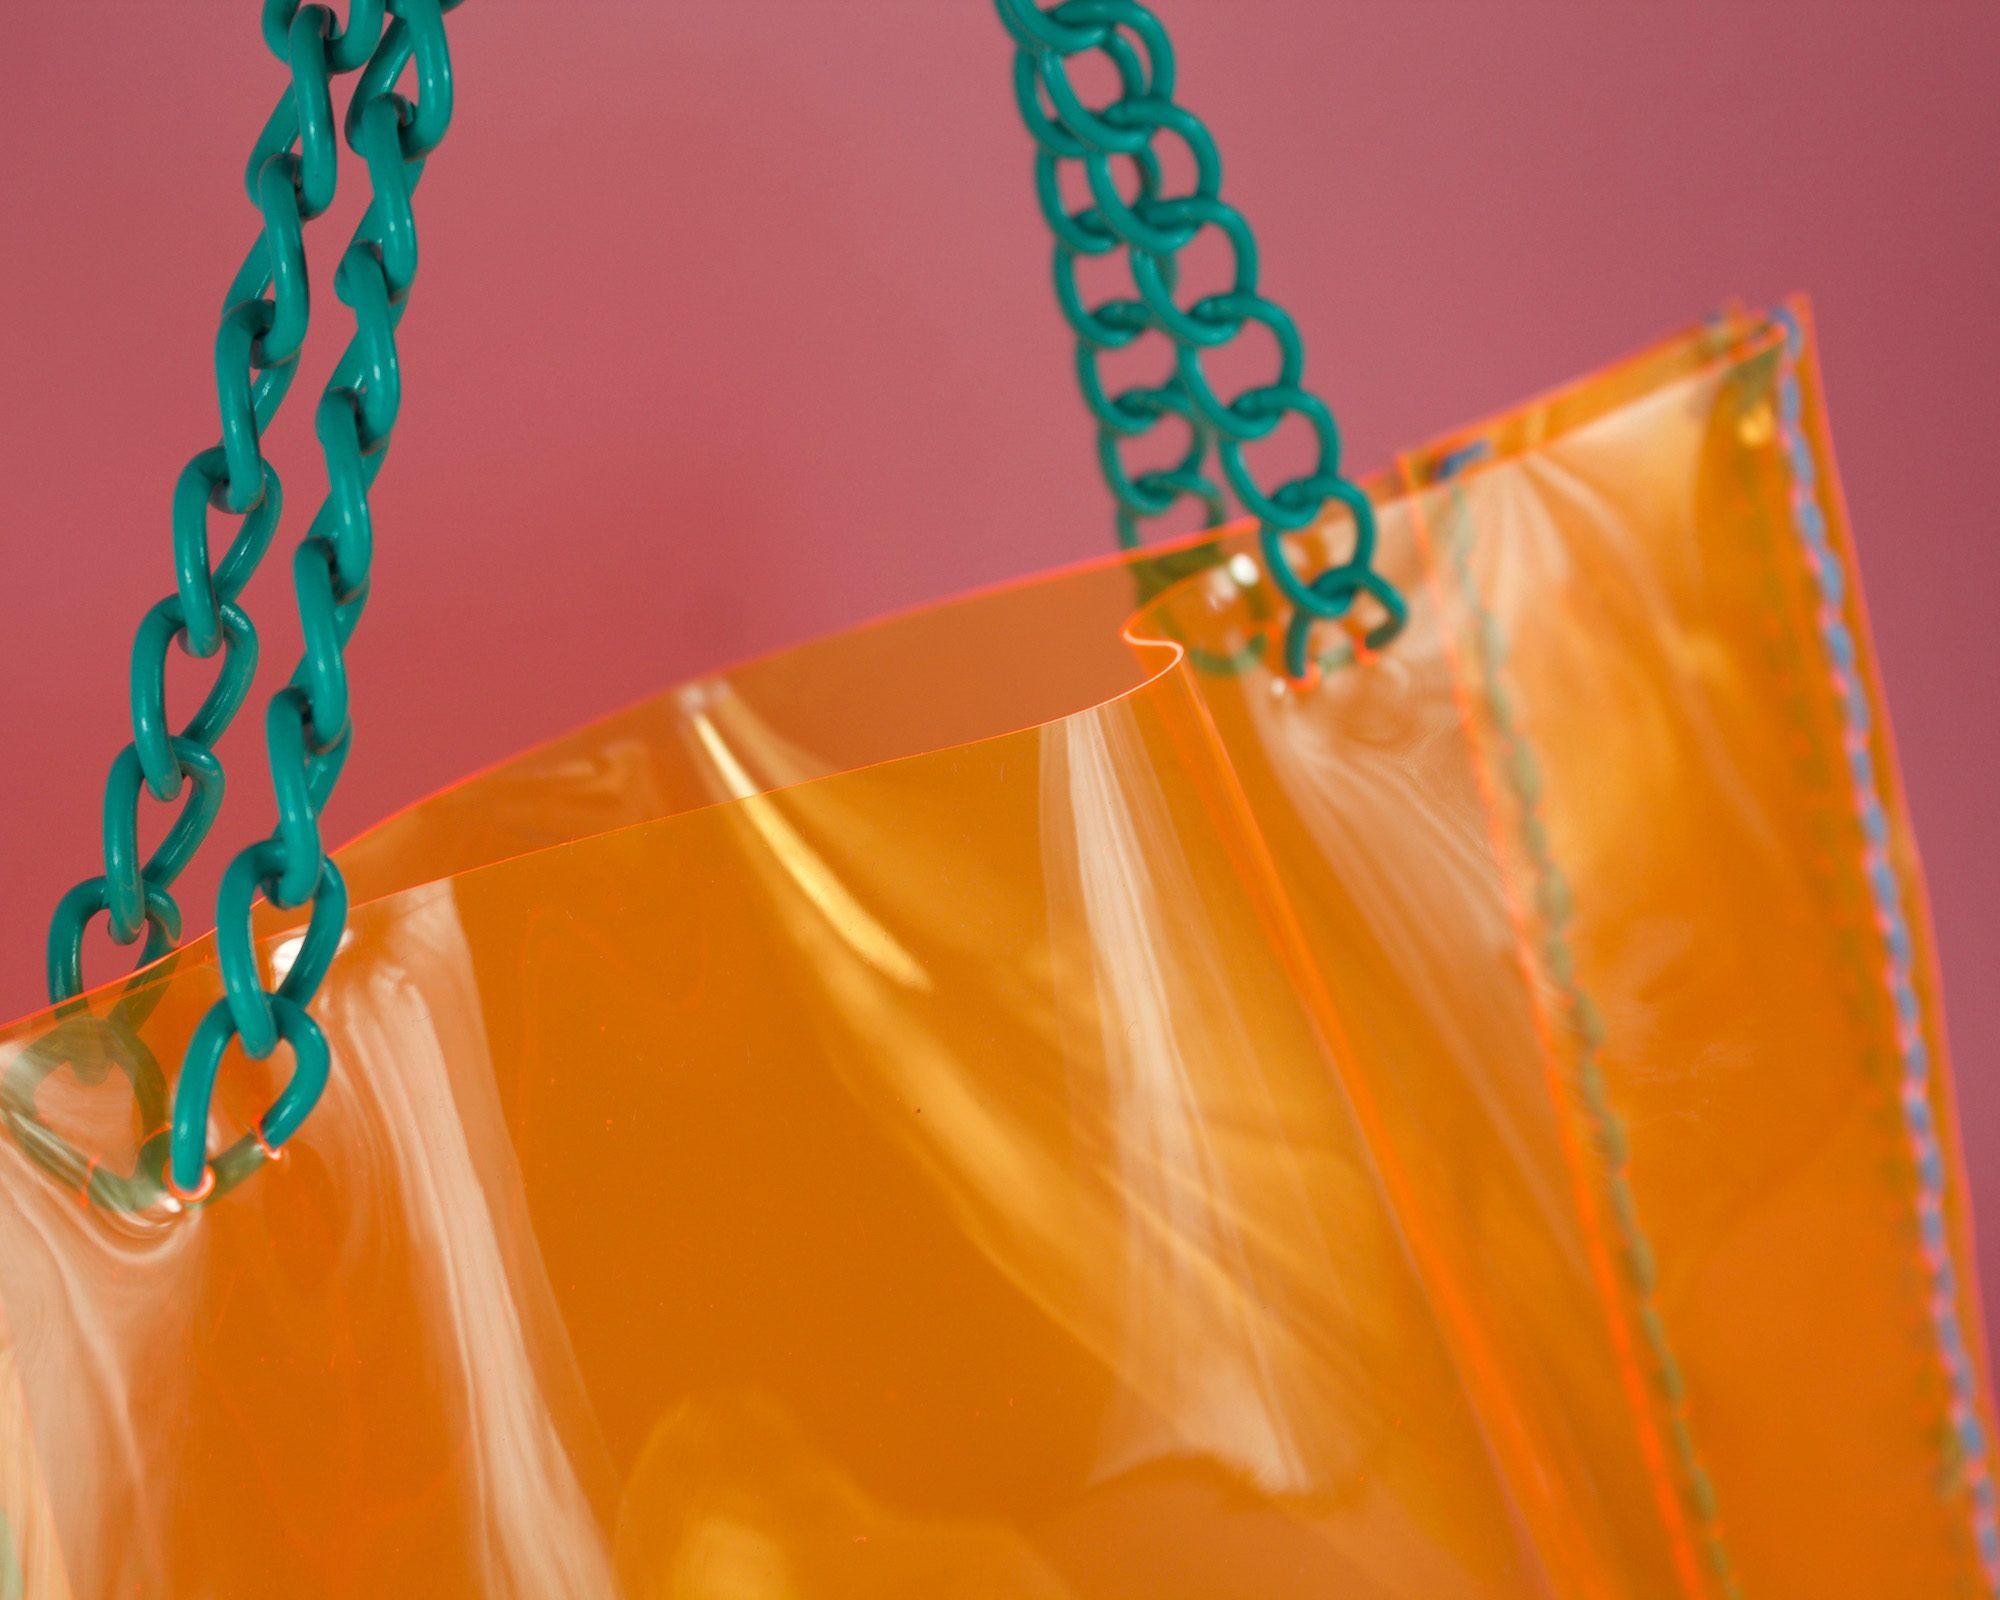 shopper-handbag-bag-clear-orange-pvc-blue-KrakenCounterCouture-handmade-london-chain